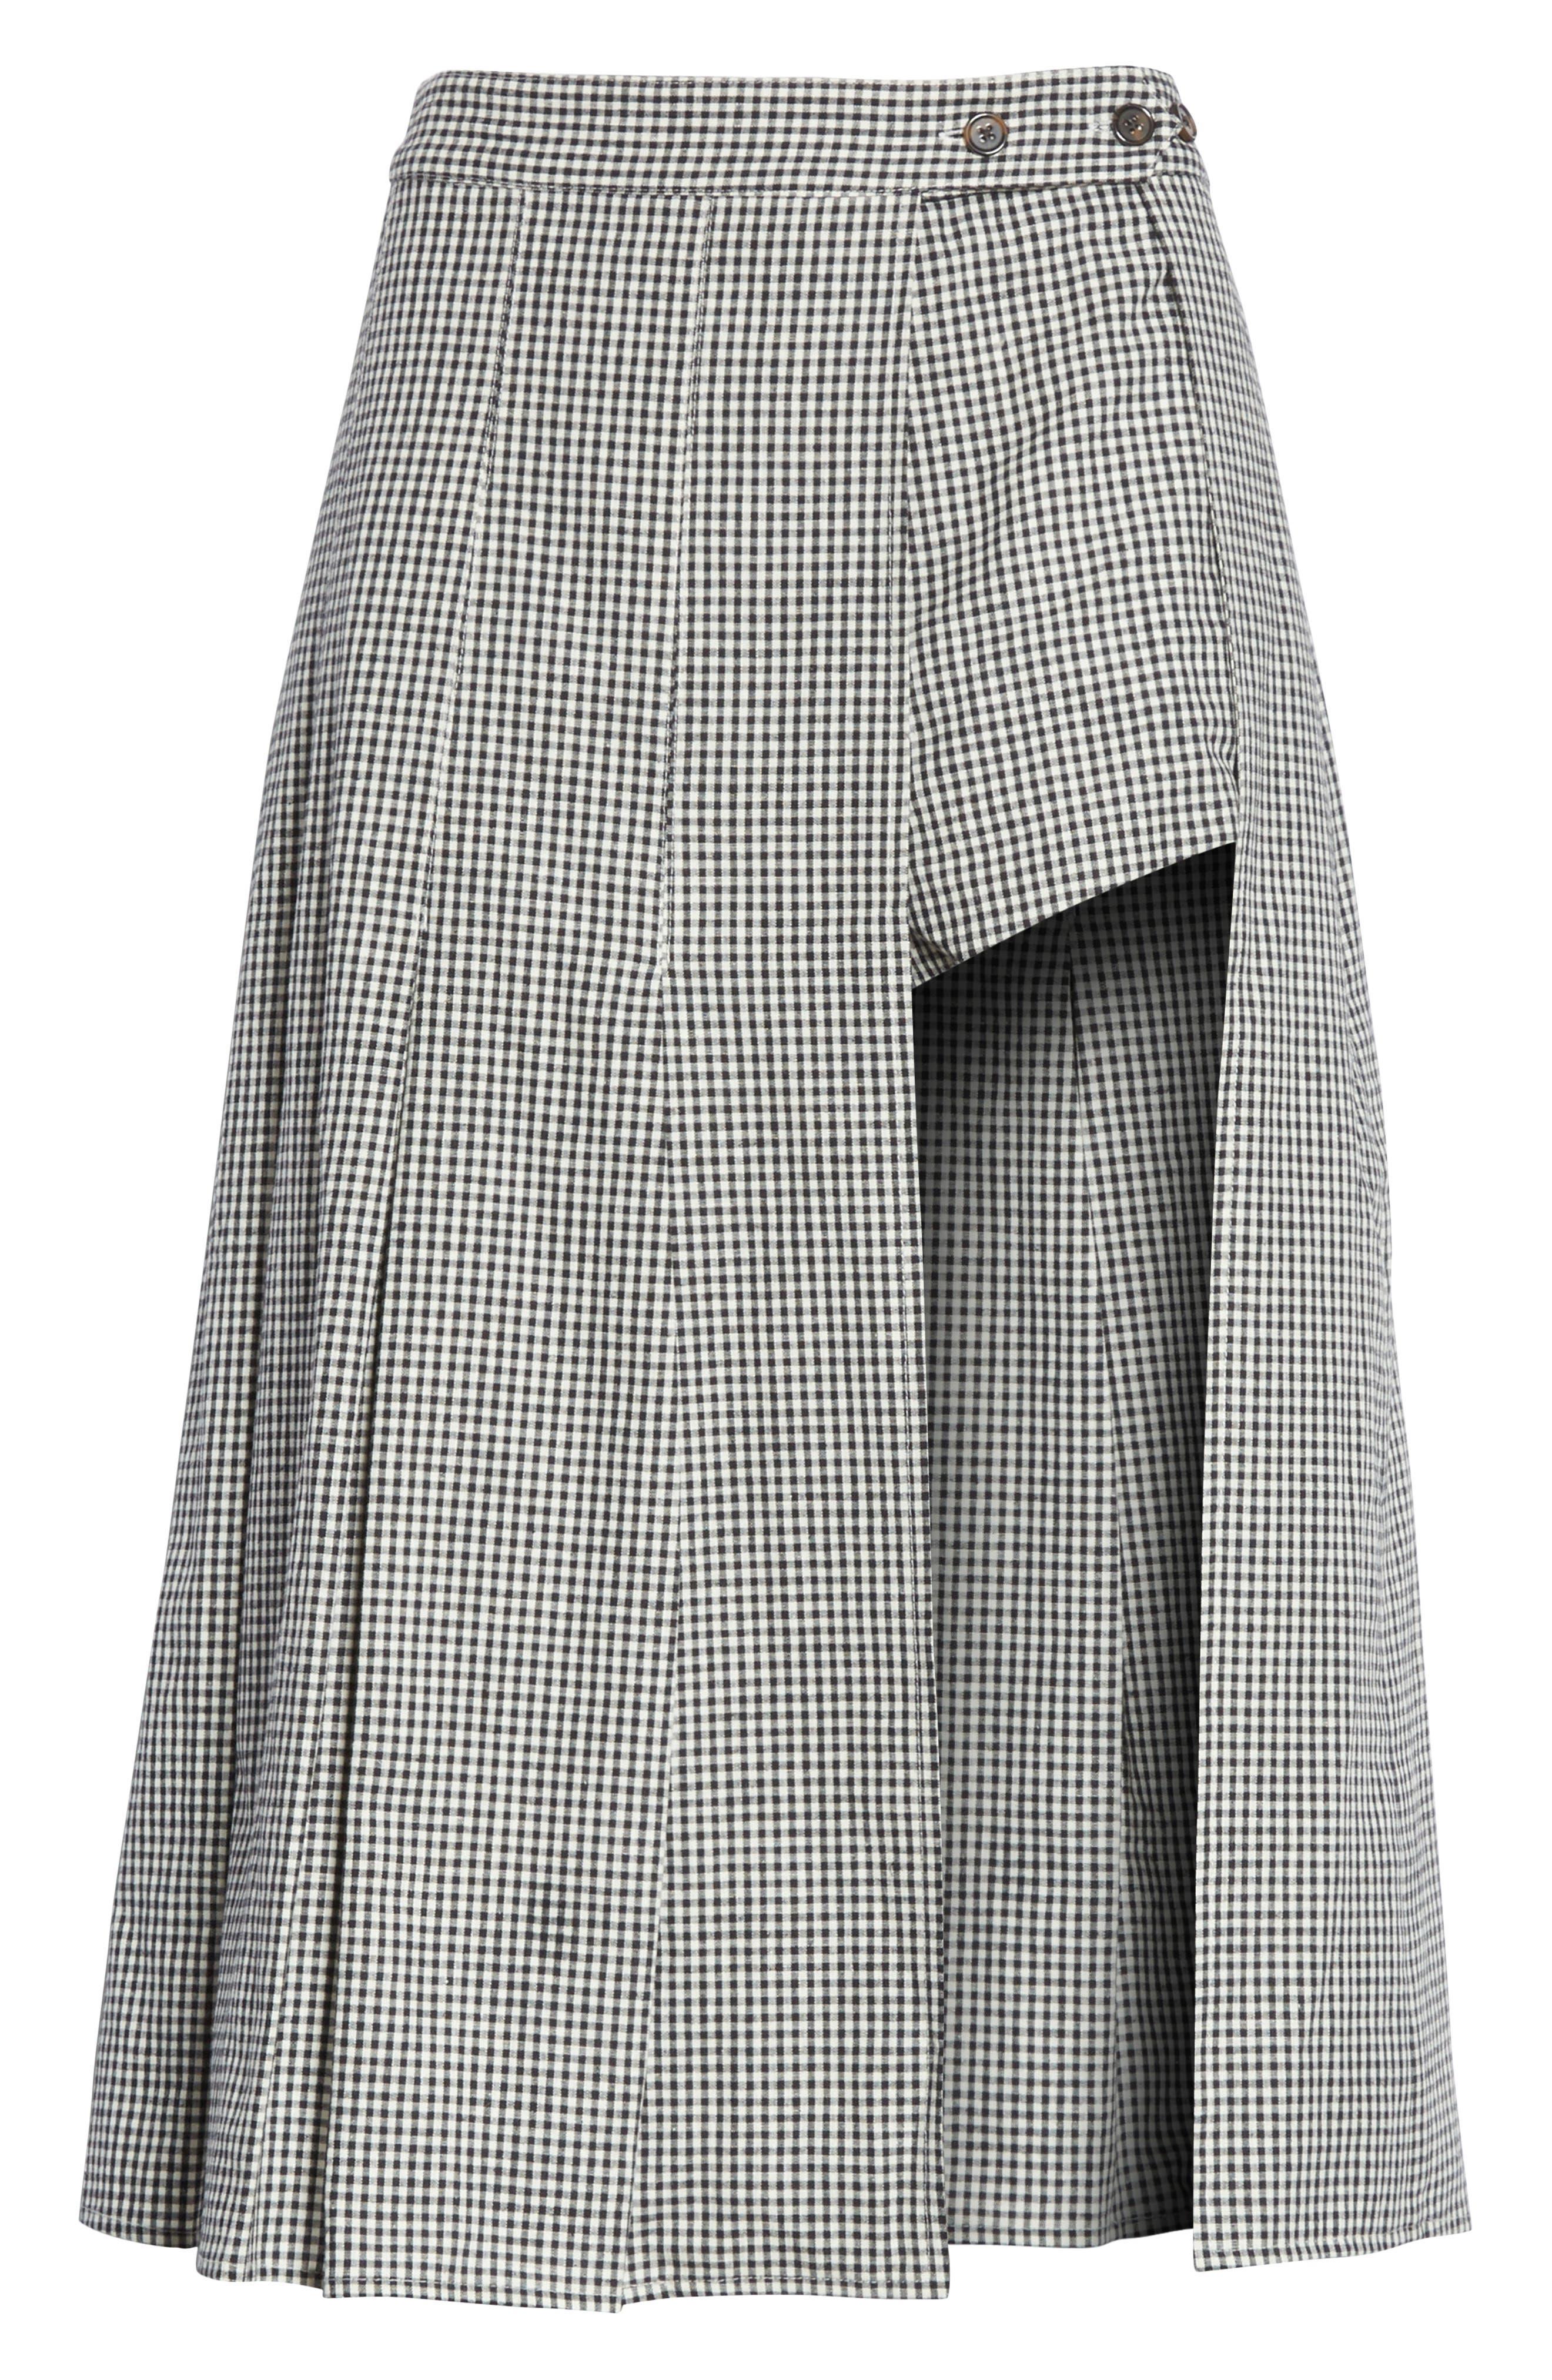 Uniform Gingham Linen & Cotton Skirt,                             Alternate thumbnail 6, color,                             004